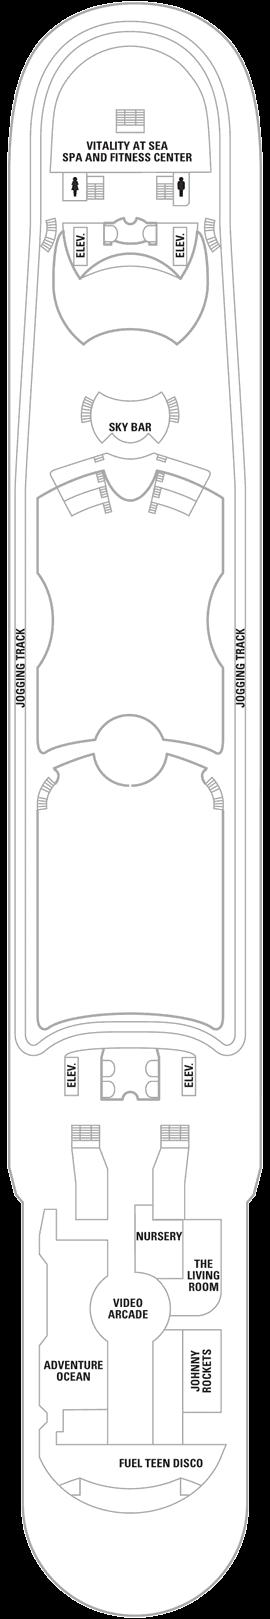 Liberty of the Seas - Deck 12